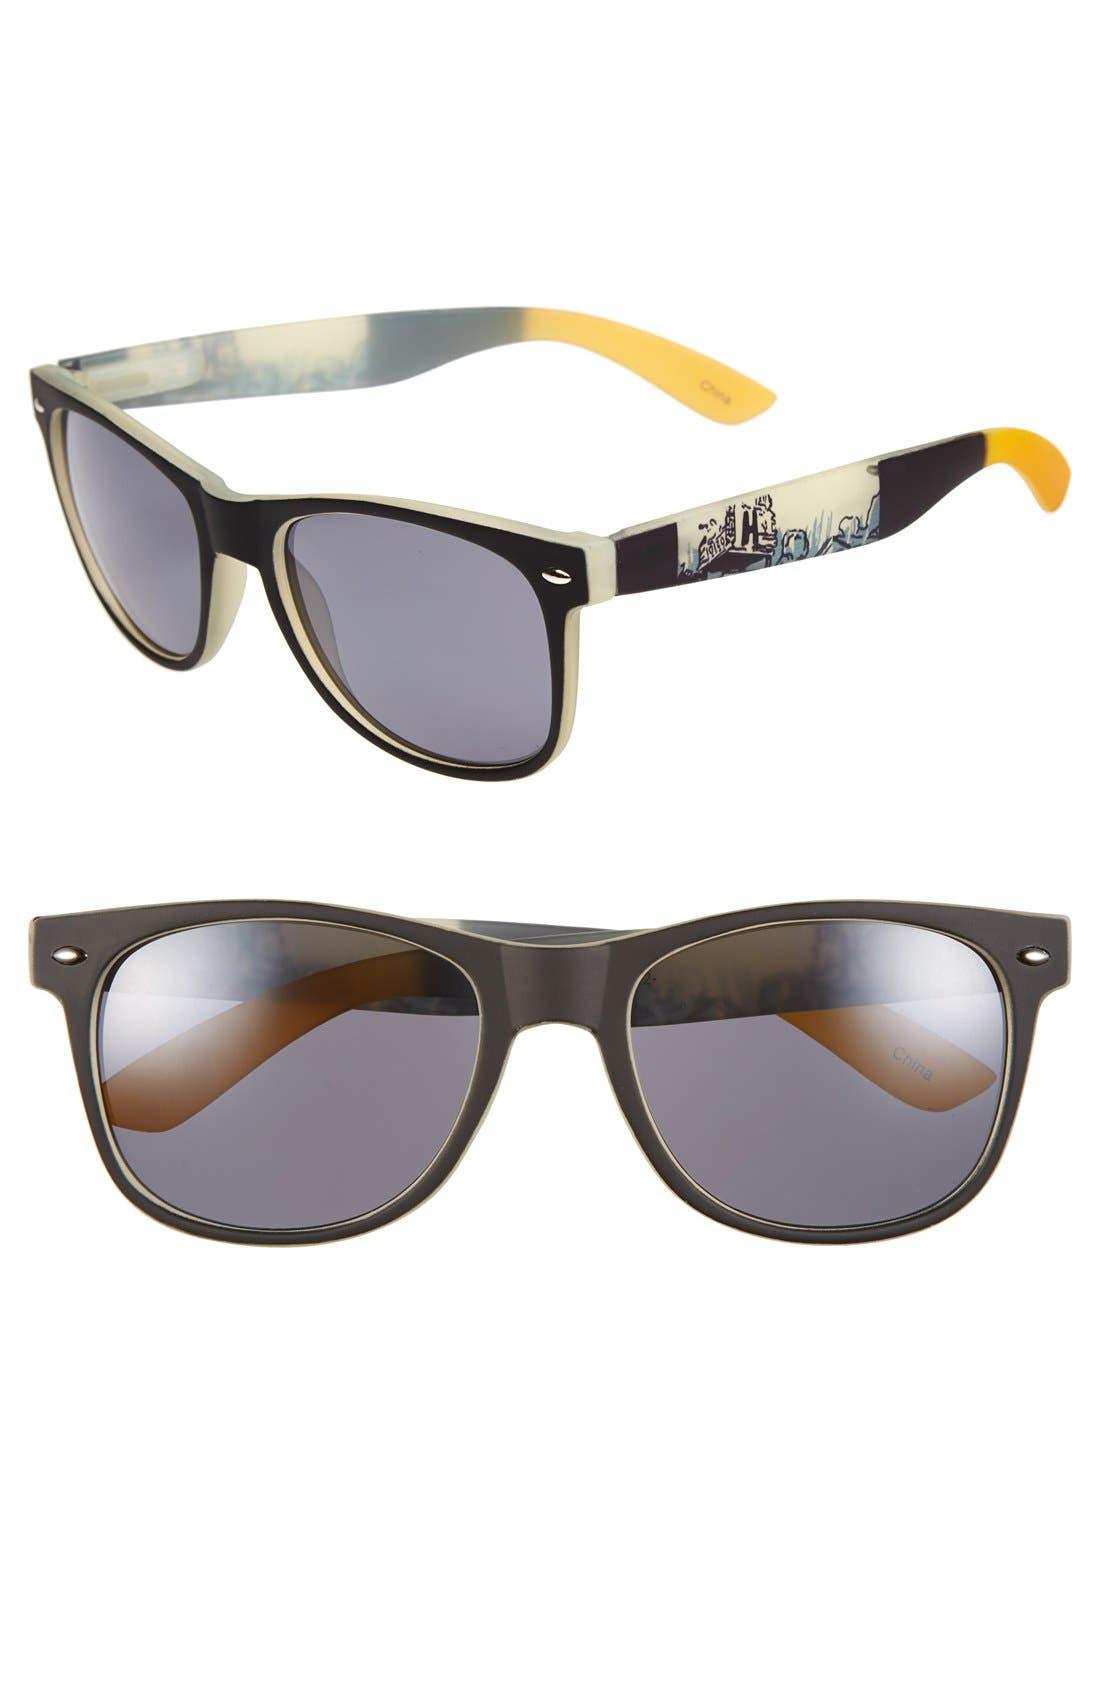 Main Image - Icon Eyewear Retro Sunglasses